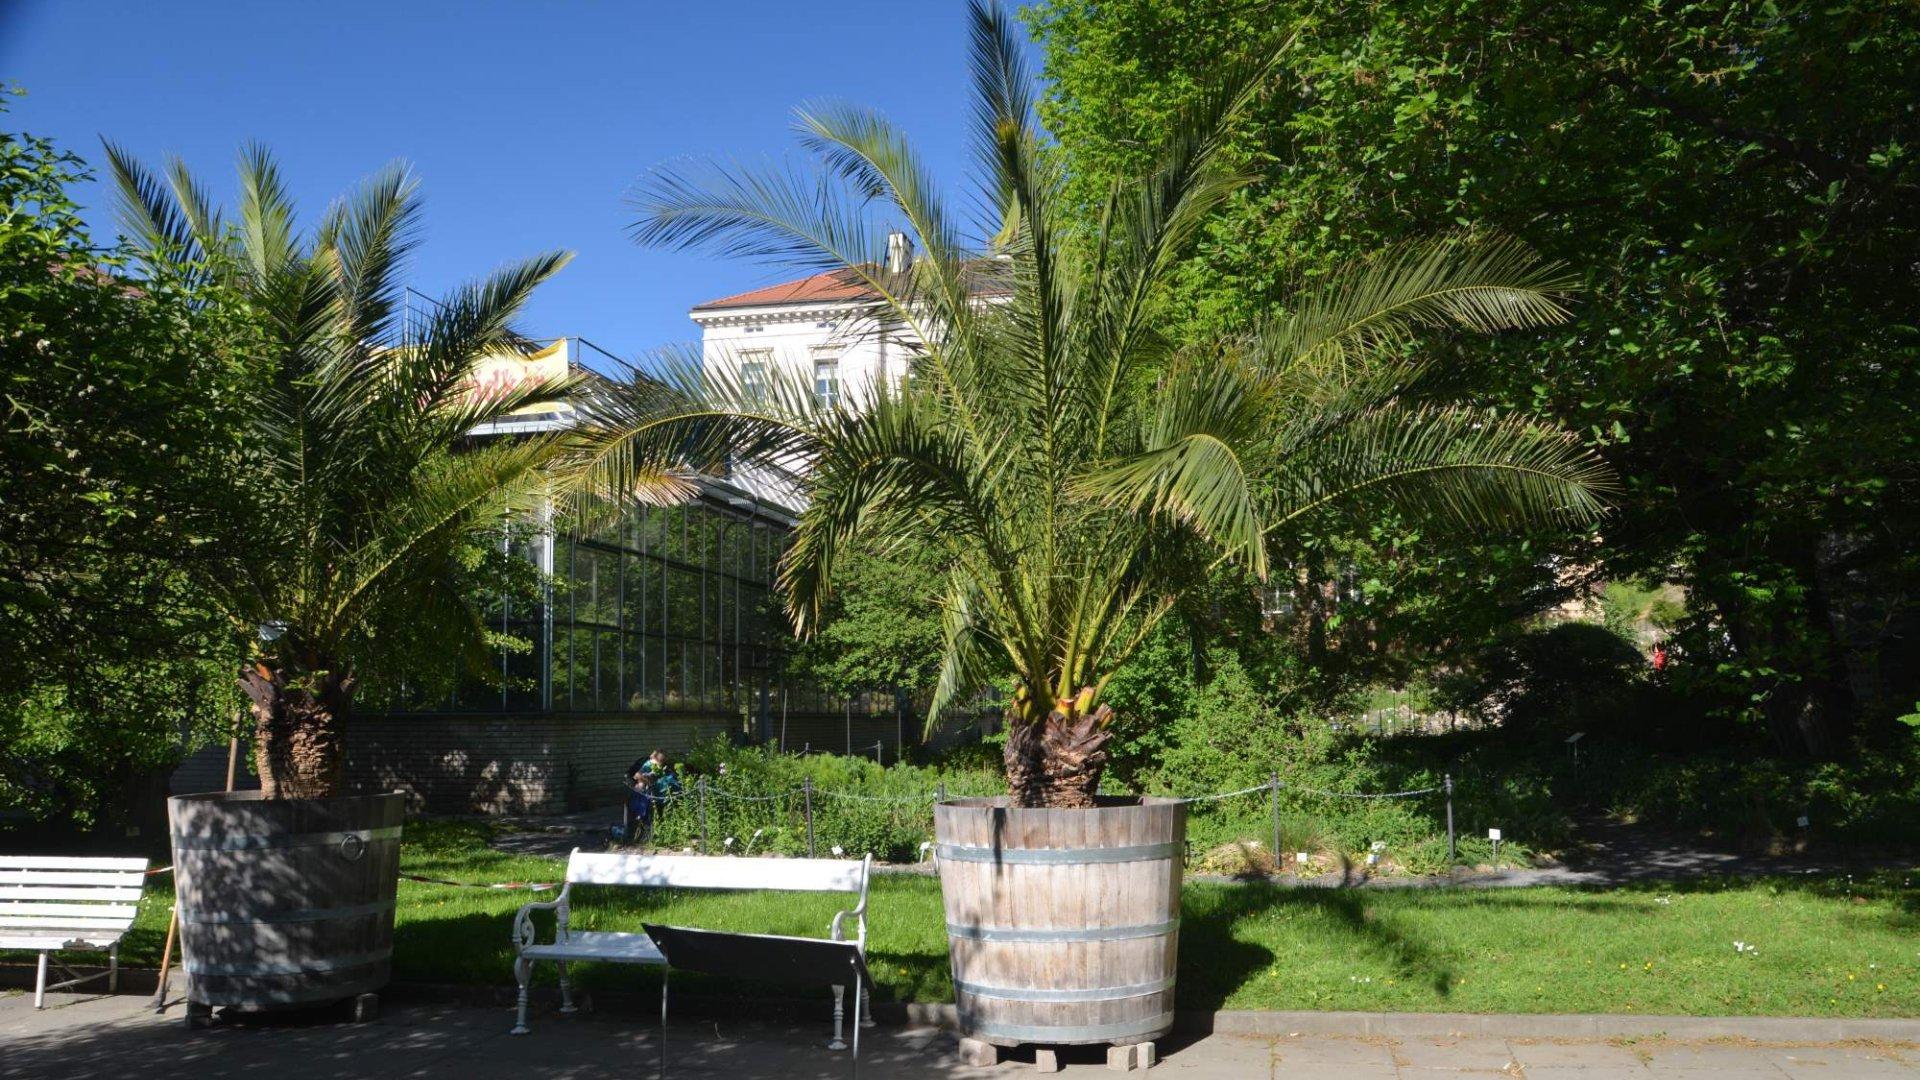 Botanická zahrada Albertov na Slupi – Průvodce areálem a tipy